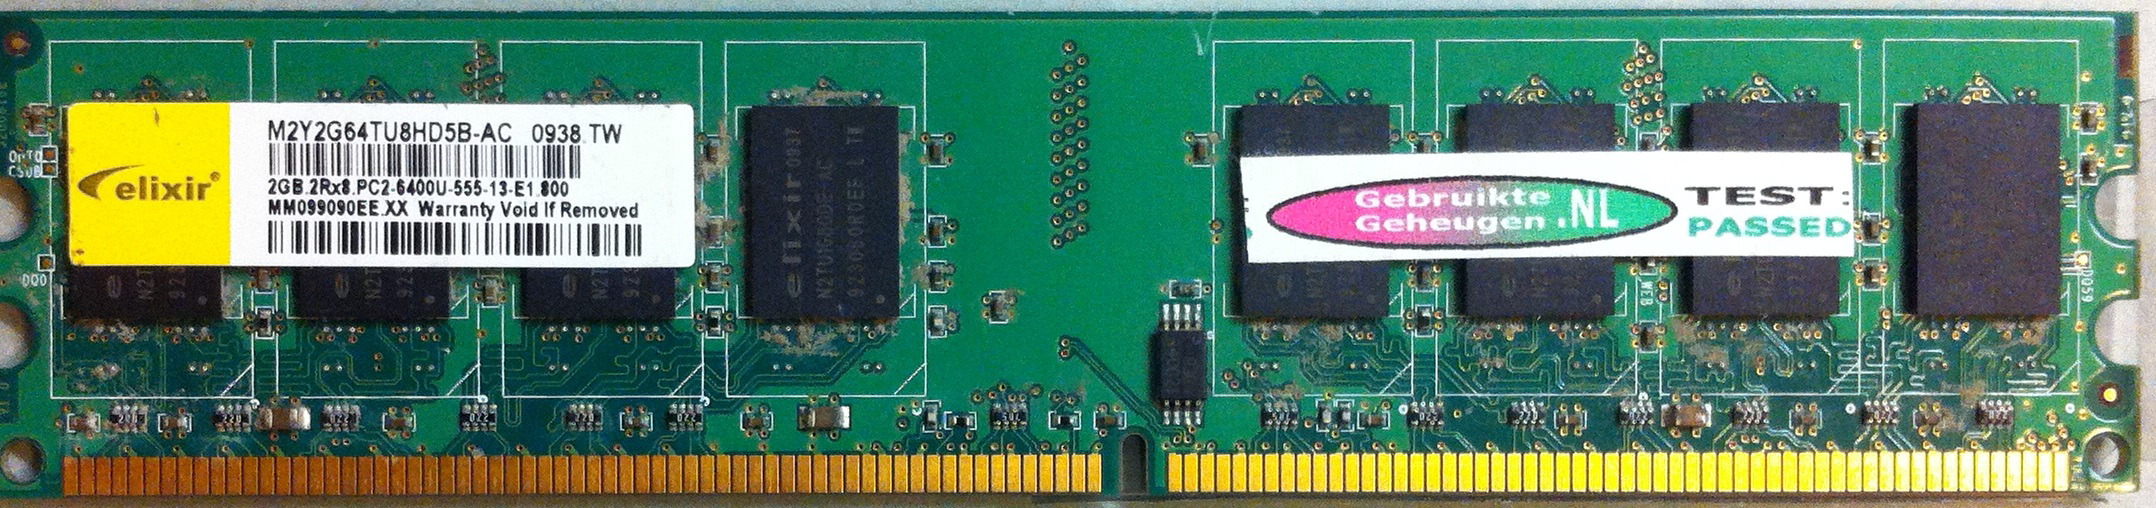 Elixir 2GB DDR2 PC2-6400U 800MHz